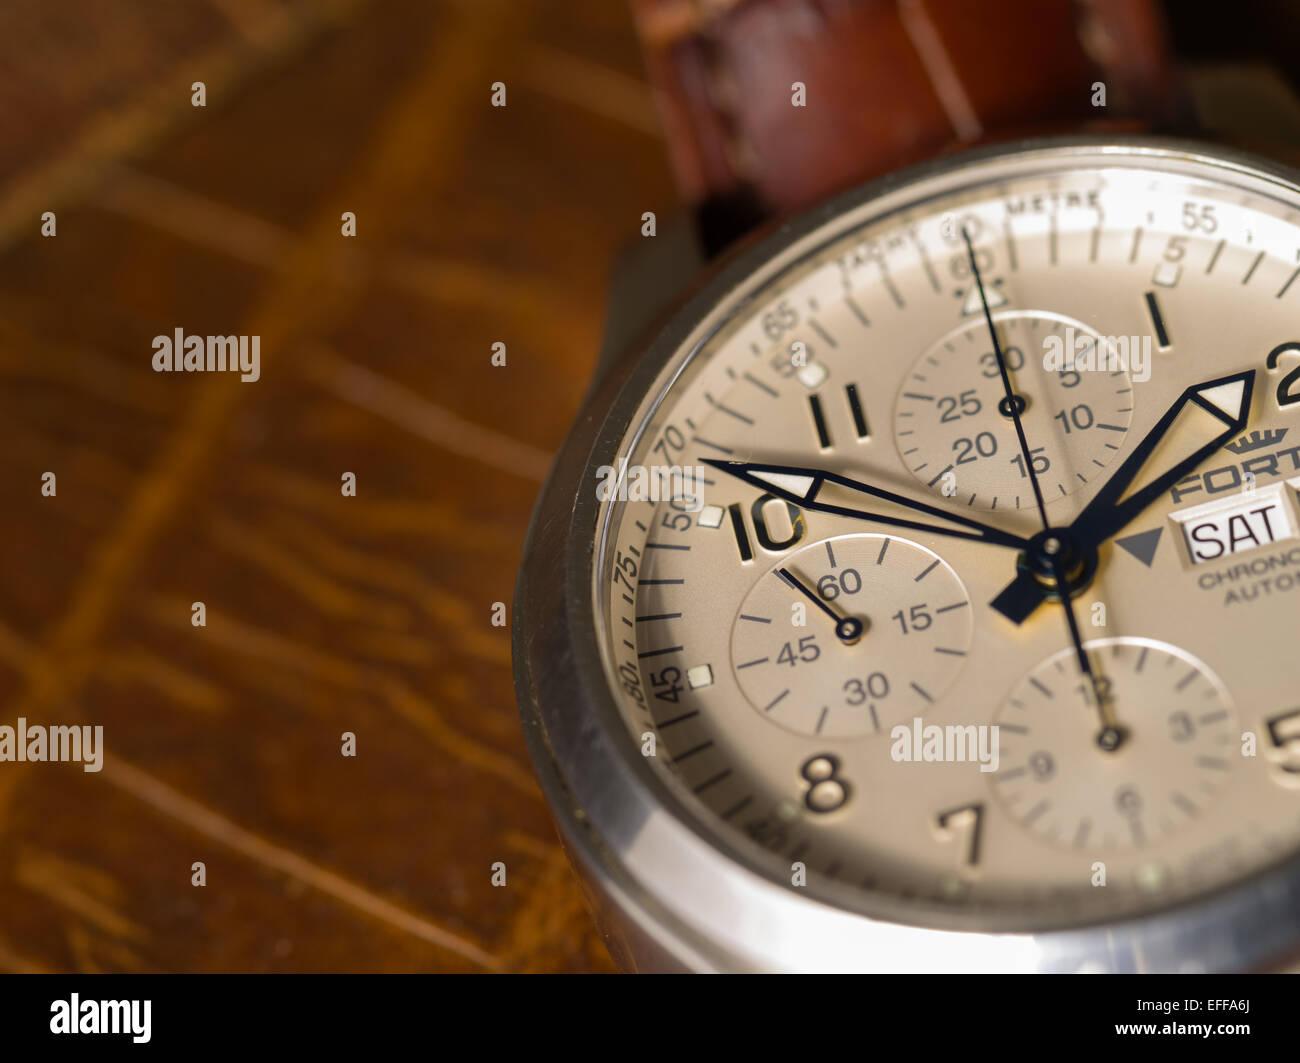 Chronograph watch - Stock Image